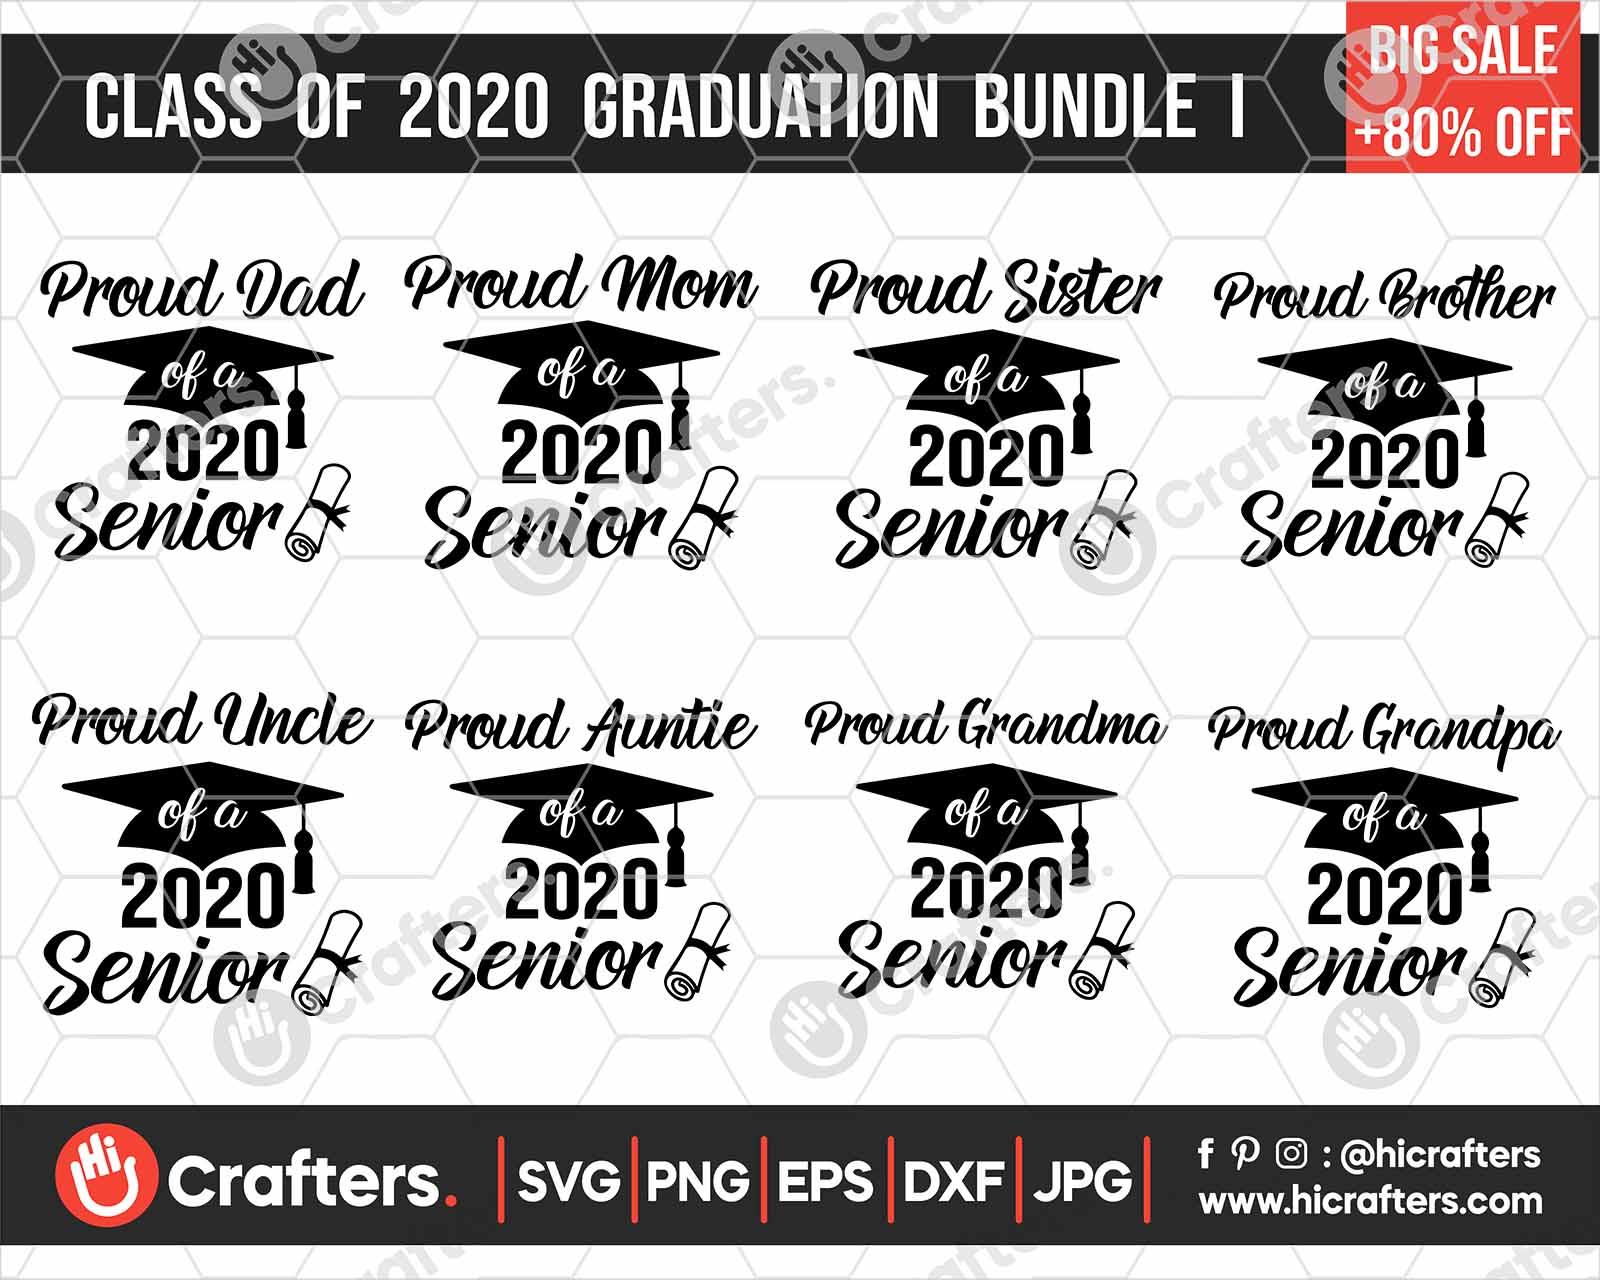 Seniors 2020 Graduation Svg Bundle Hi Crafters